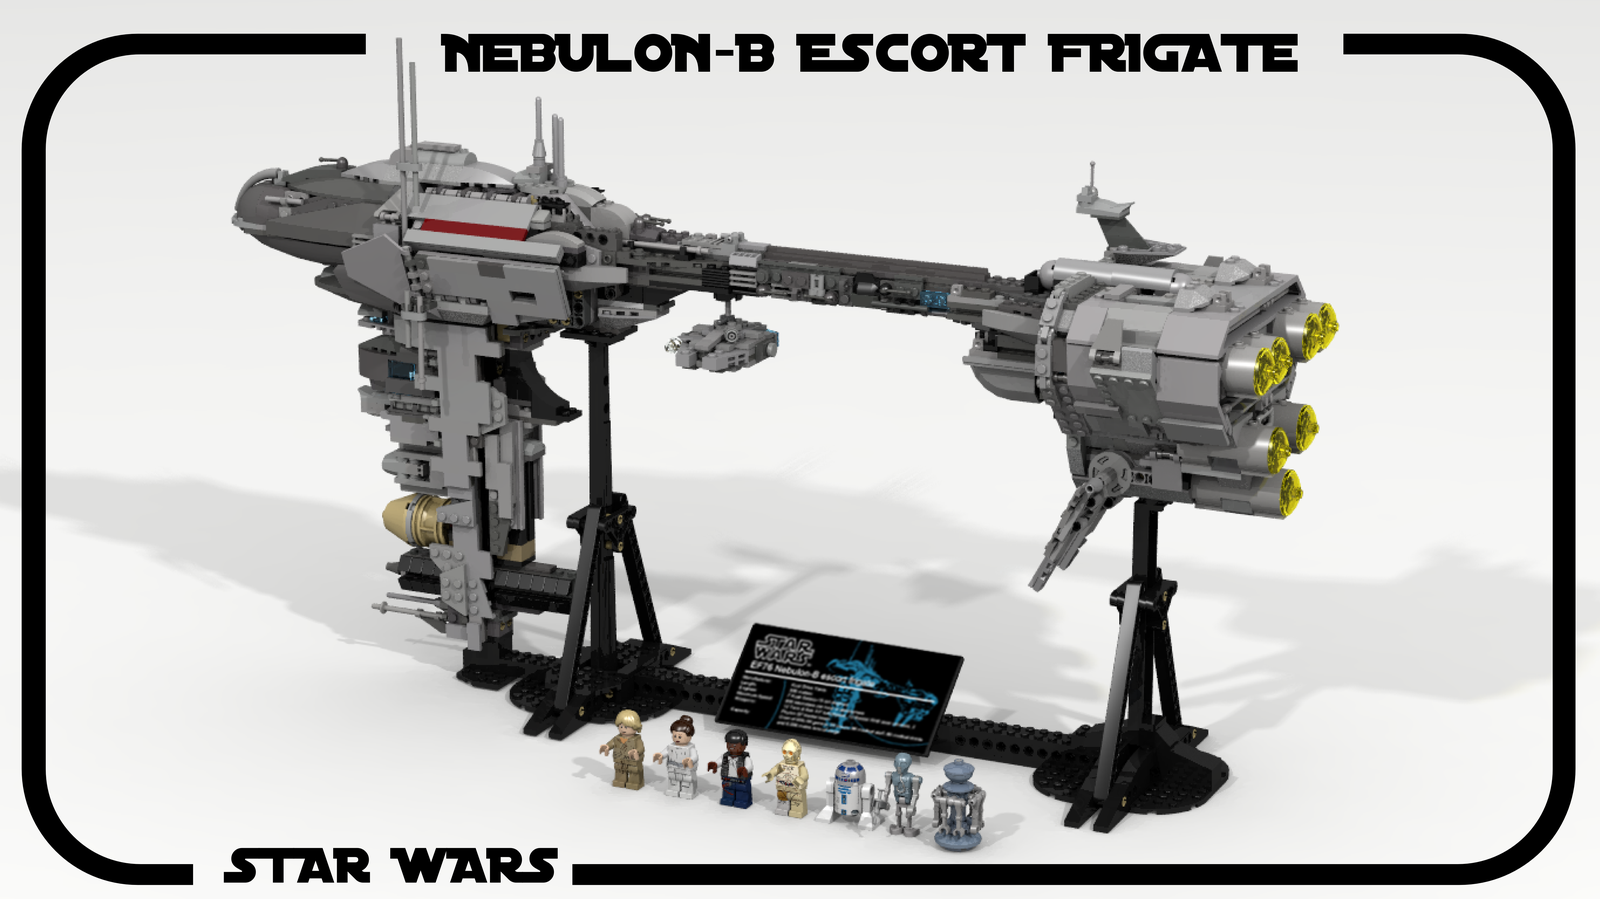 Lego Ideas Product Nebulon B Escort Frigate 7665 Star Wars Republic Cruiser